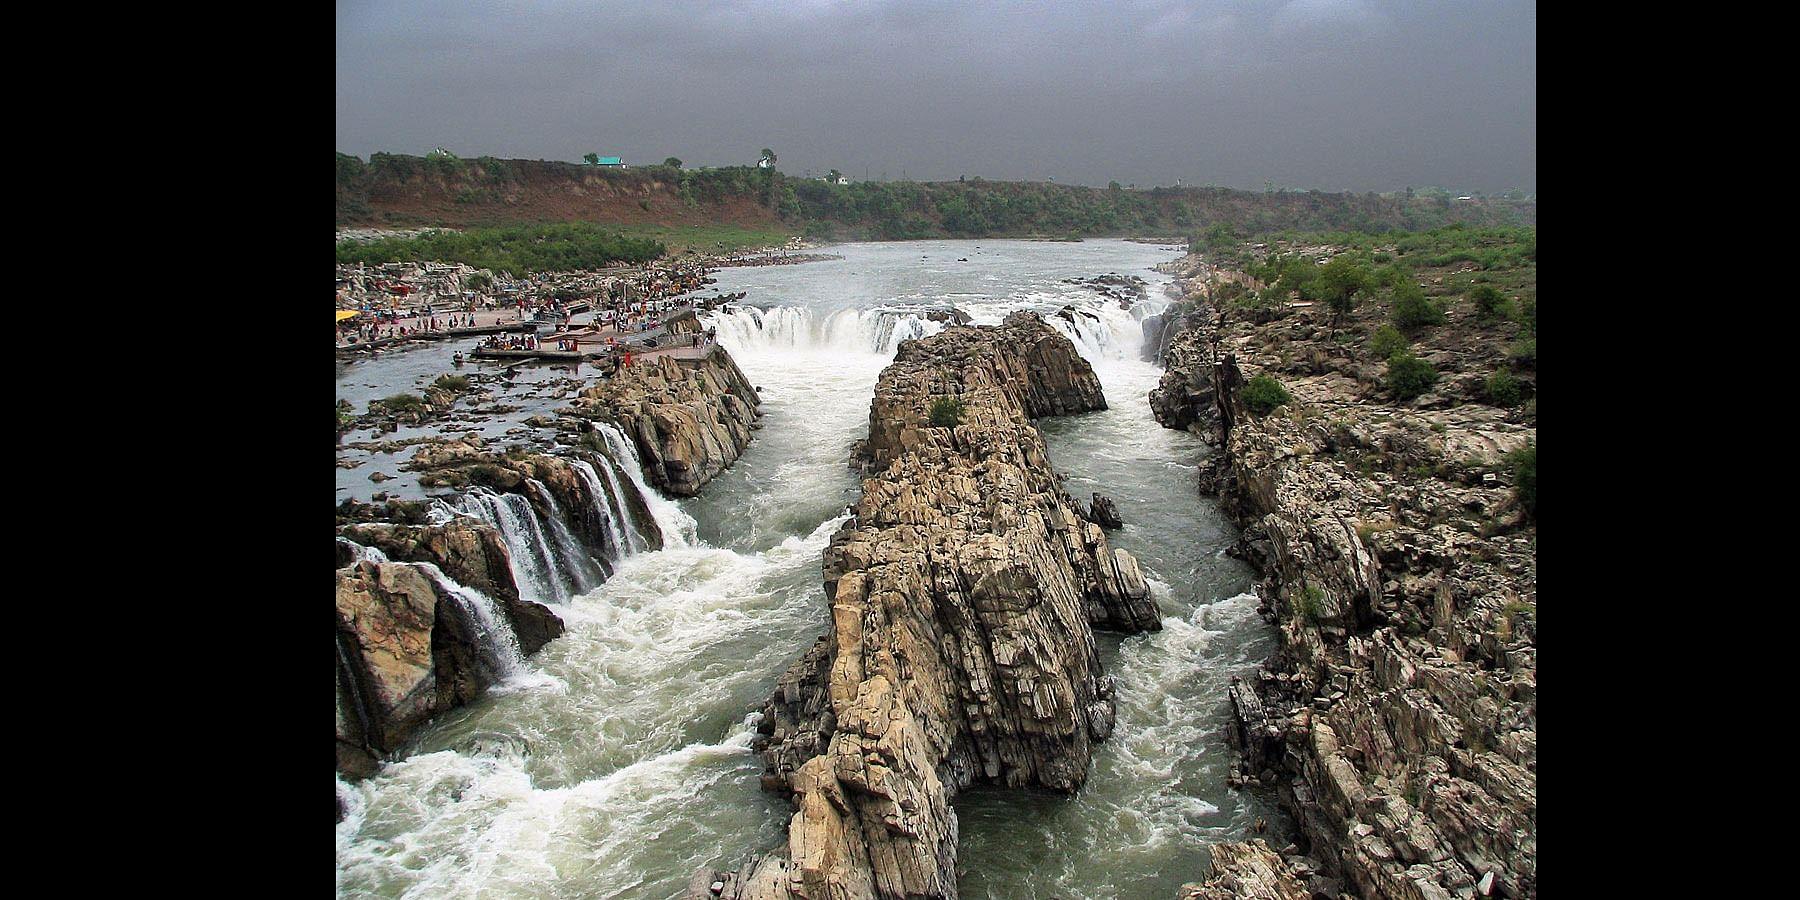 Dhuandhar Waterfalls - Jabalpur, Madhya Pradesh, India